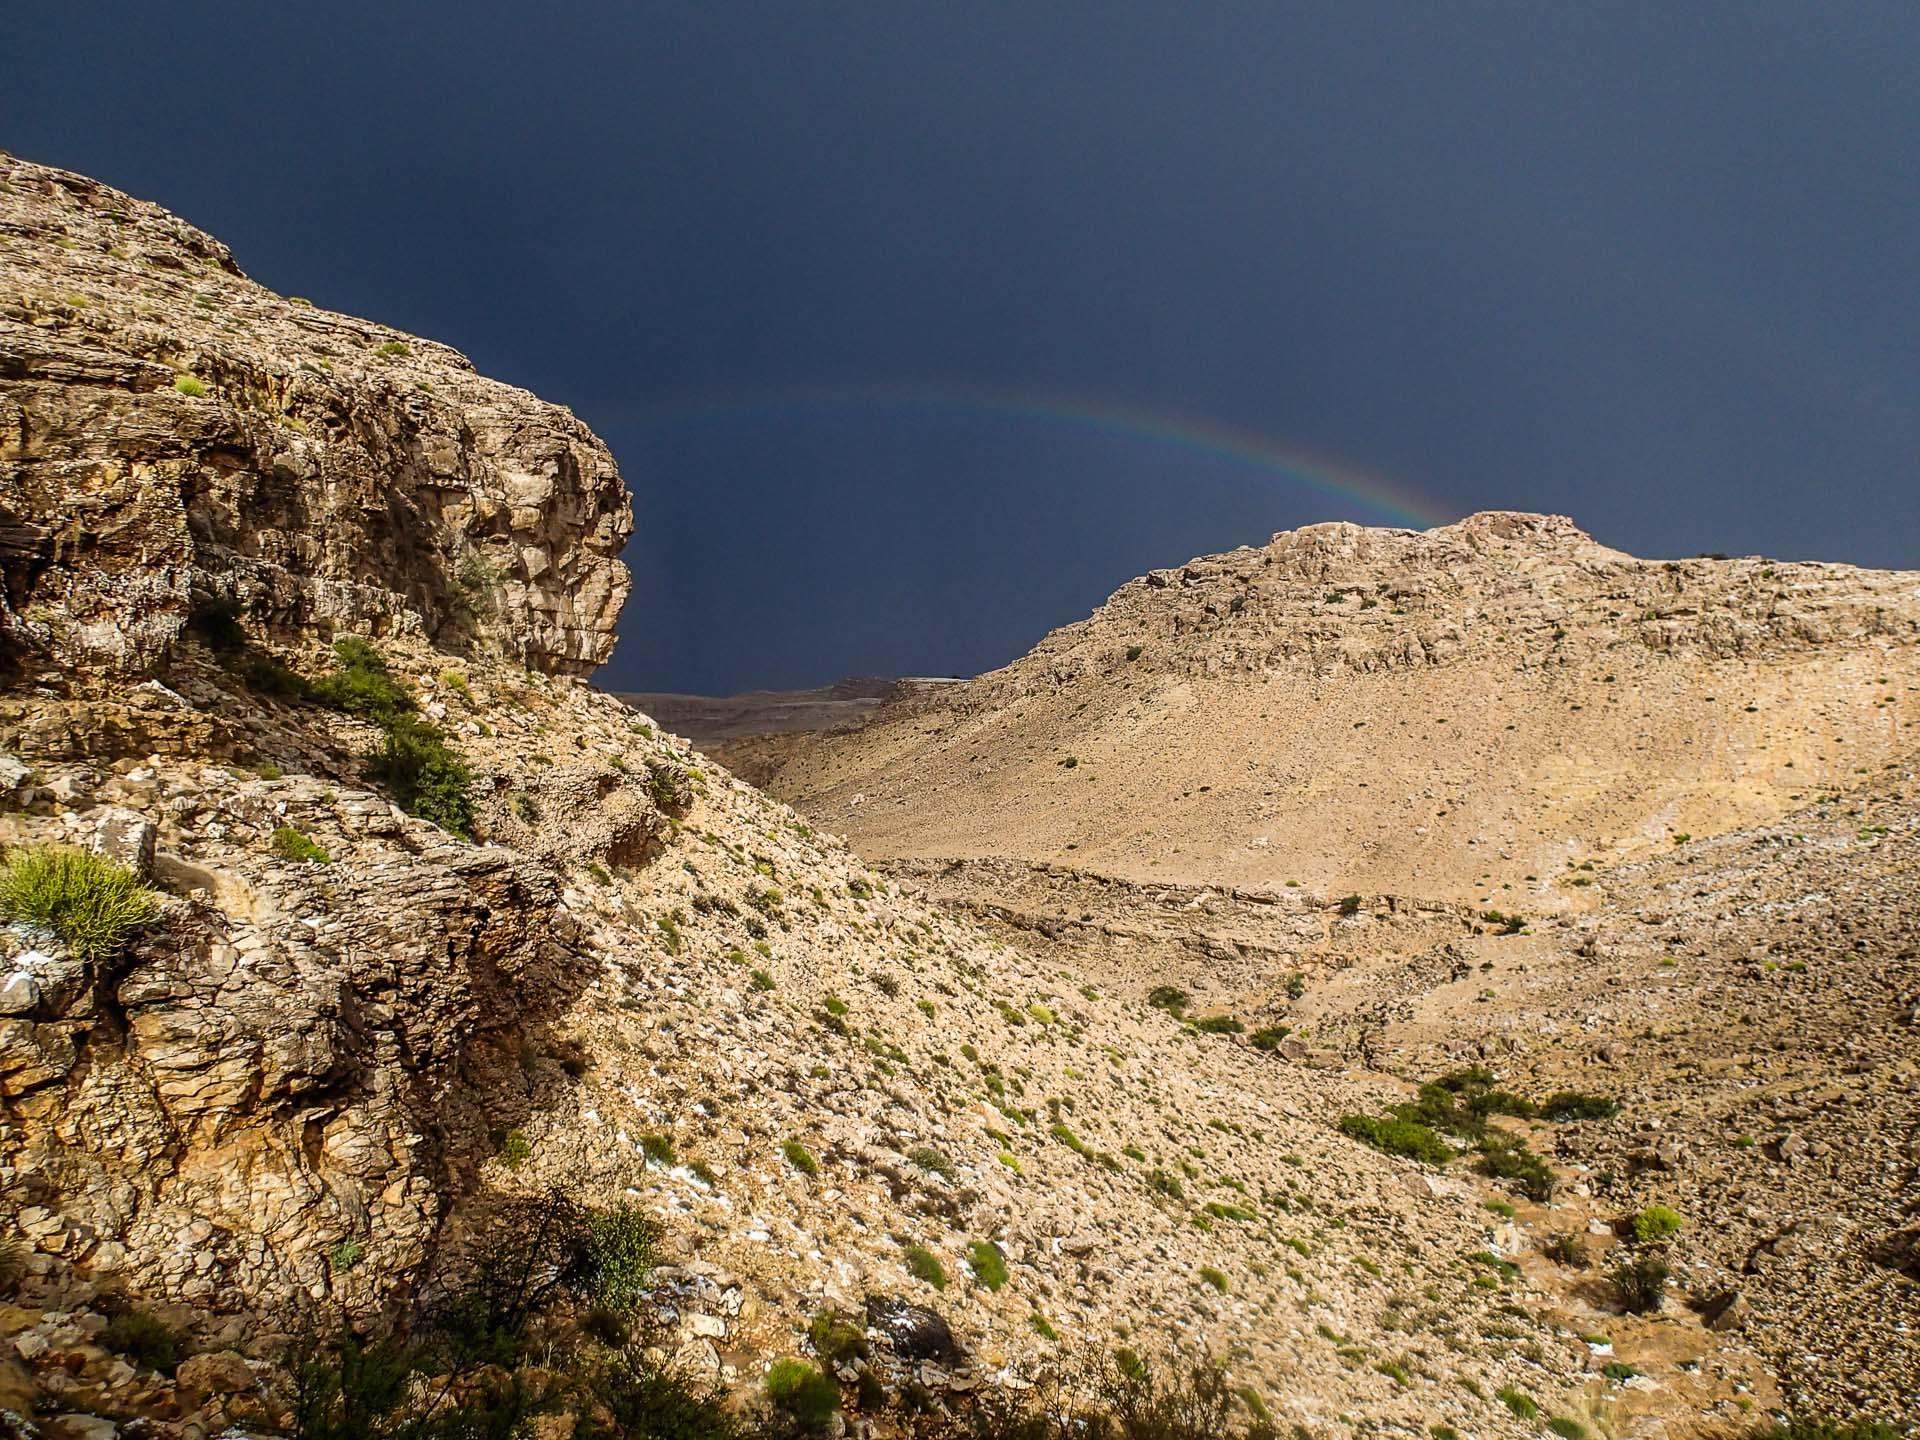 Eastern Hajar Mountains